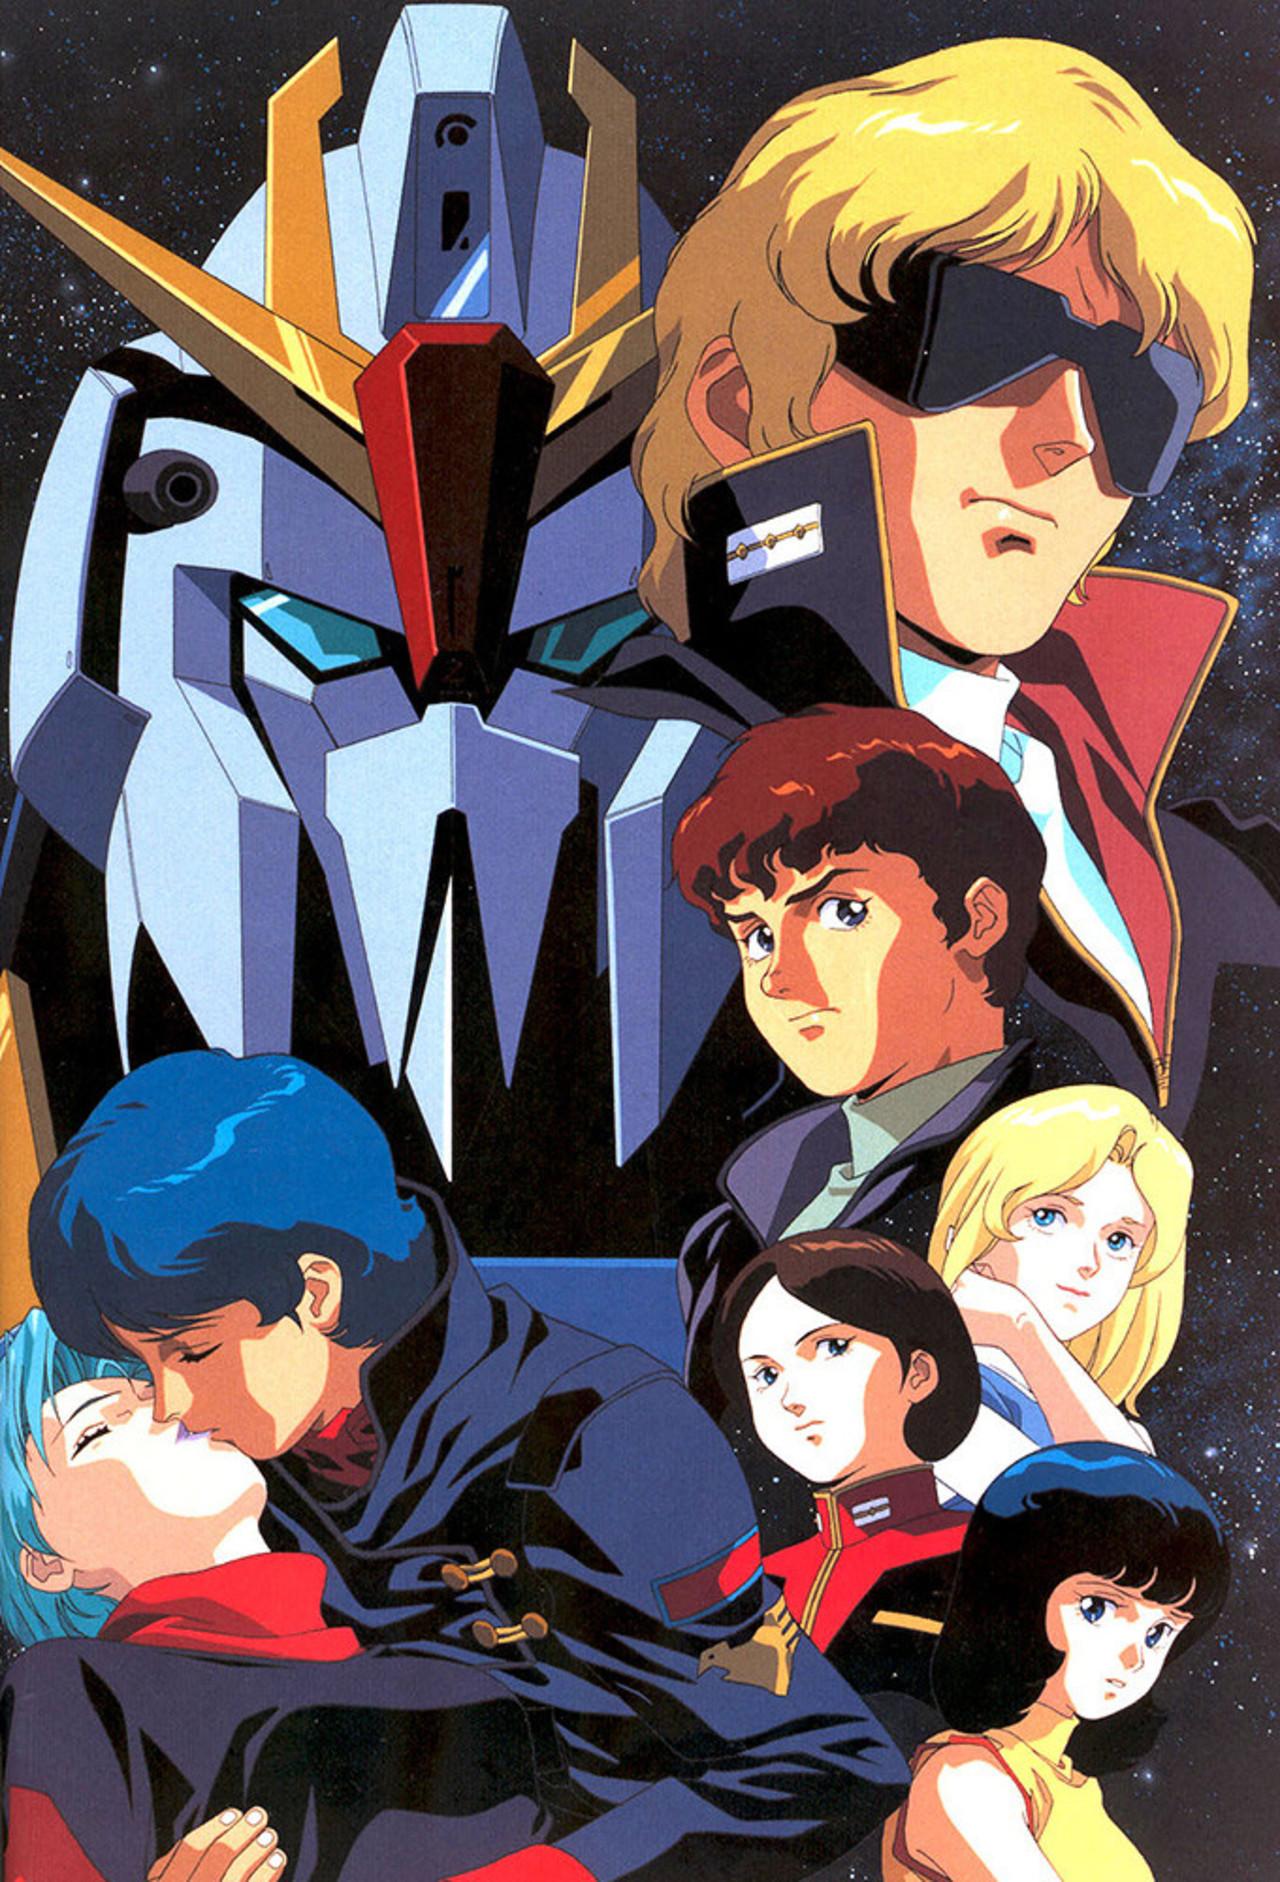 Mobile Suit Zeta Gundam kapak